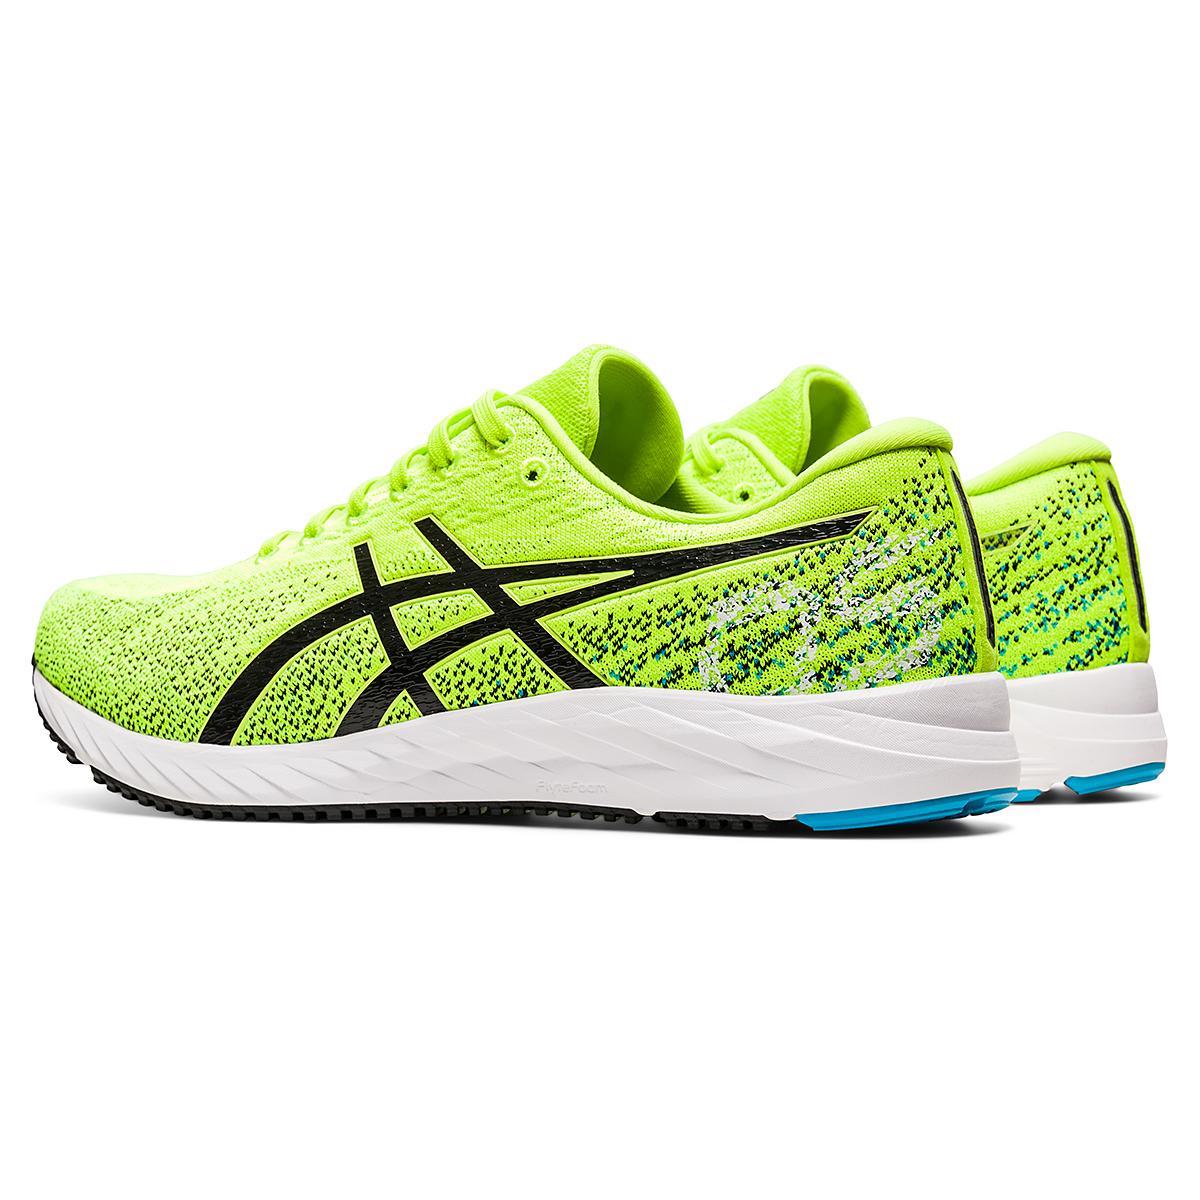 Men's Asics Gel-DS Trainer 26 Running Shoe - Color: Hazard Green/Black - Size: 6 - Width: Regular, Hazard Green/Black, large, image 4